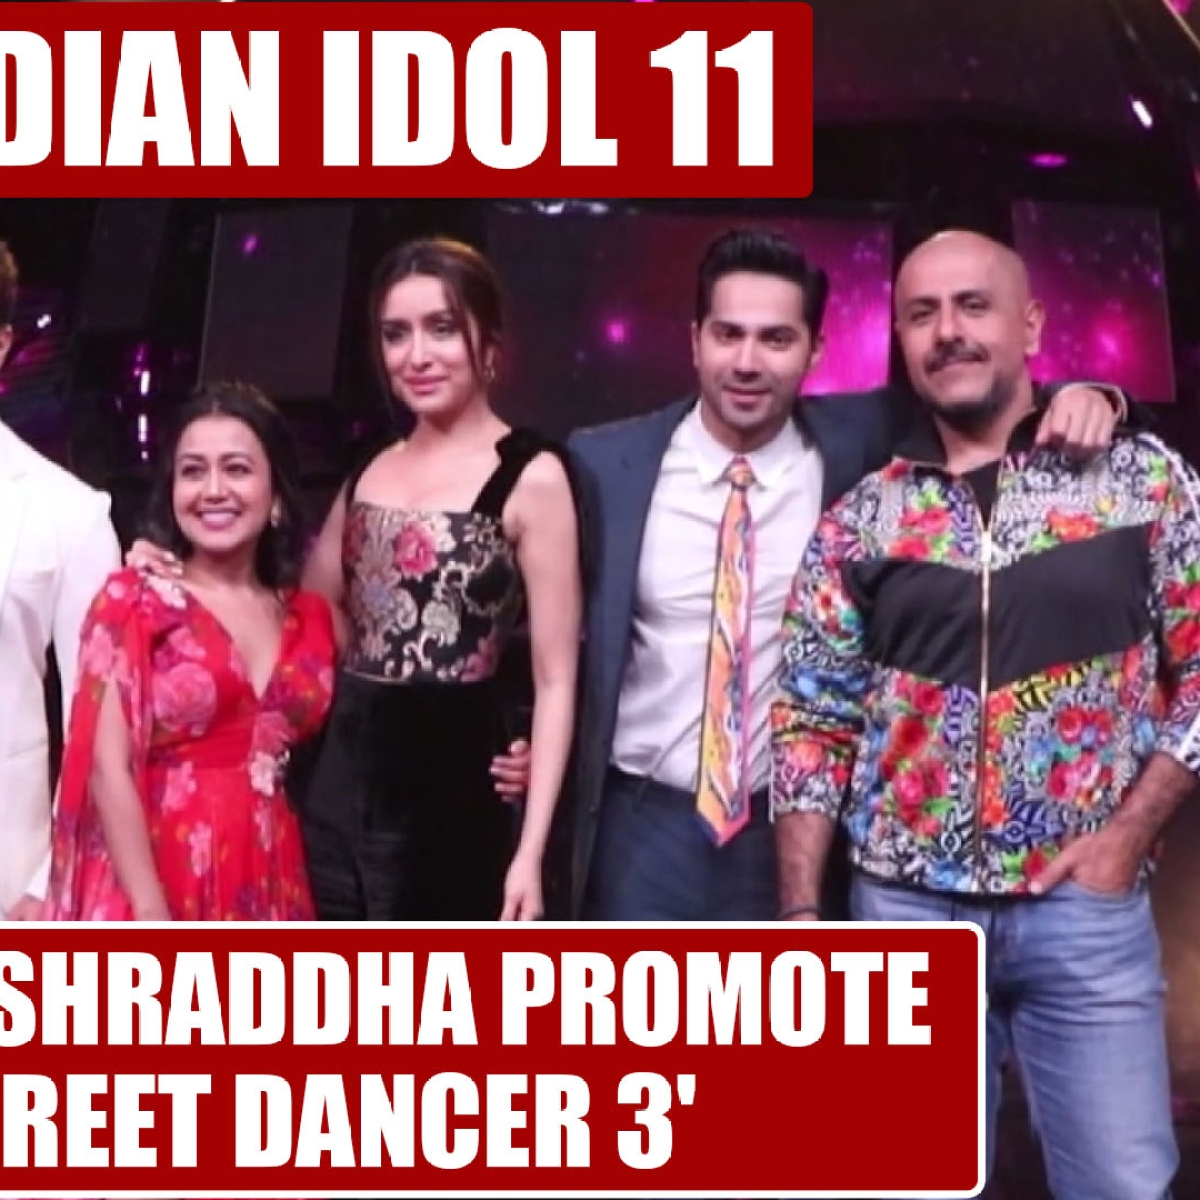 Varun Dhavan, Shraddha Kapoor promote 'Street Dancer 3' on 'Indian Idol Season 11'